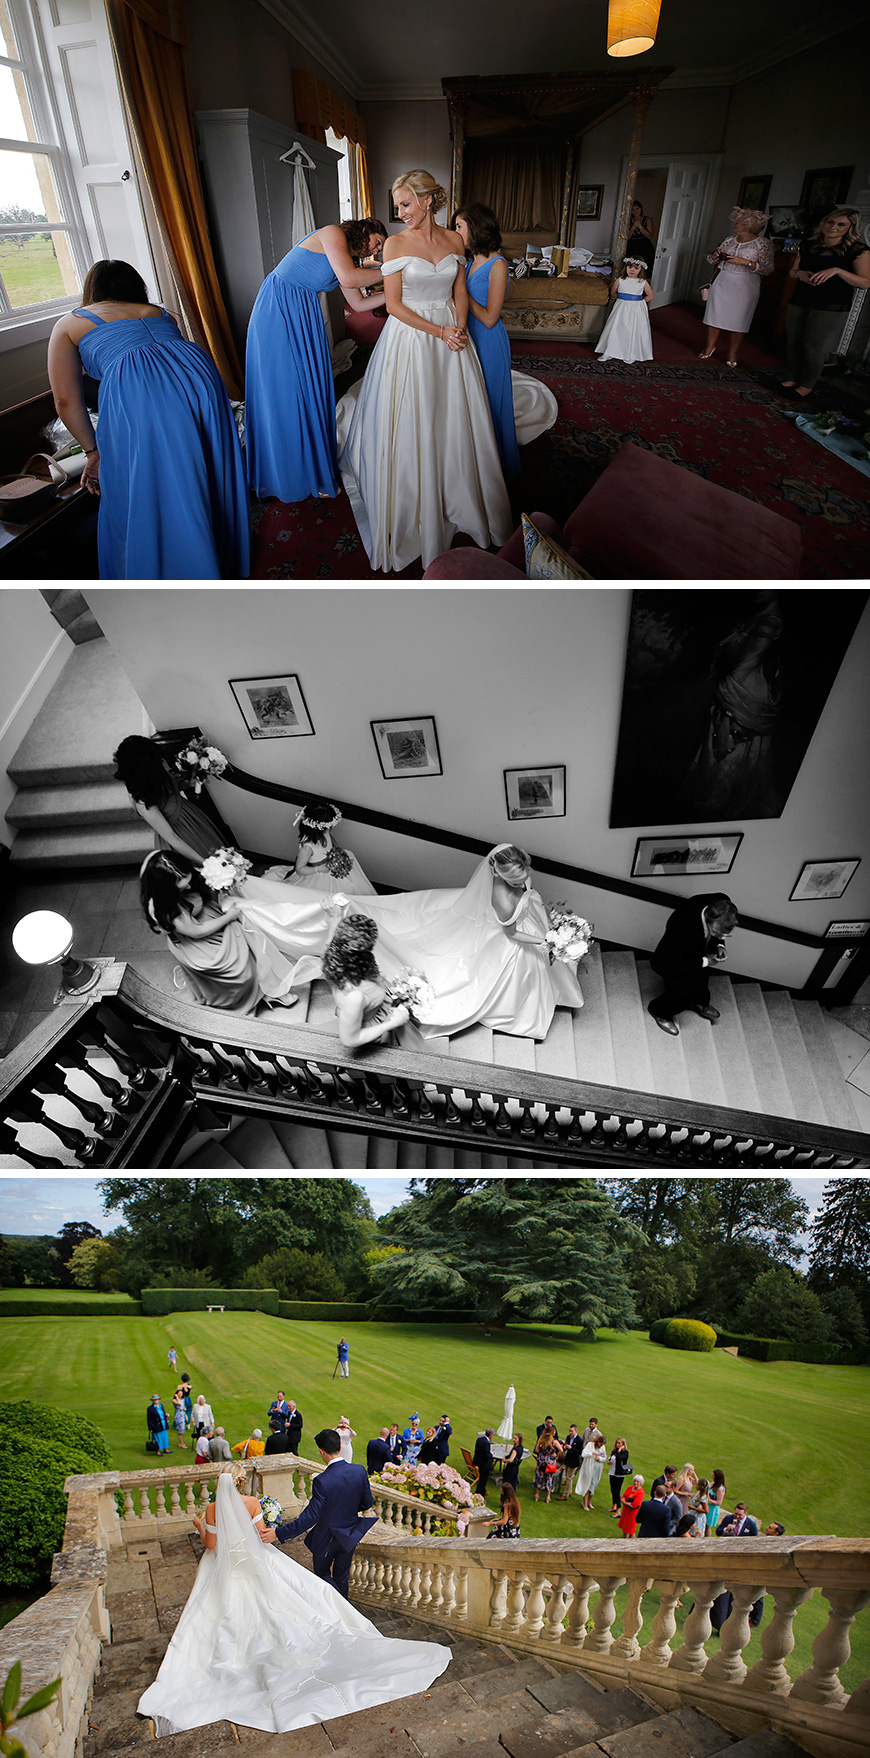 Real Wedding - Jennifer and David's Elegant Summer Wedding at Kirtlington Park | CHWV